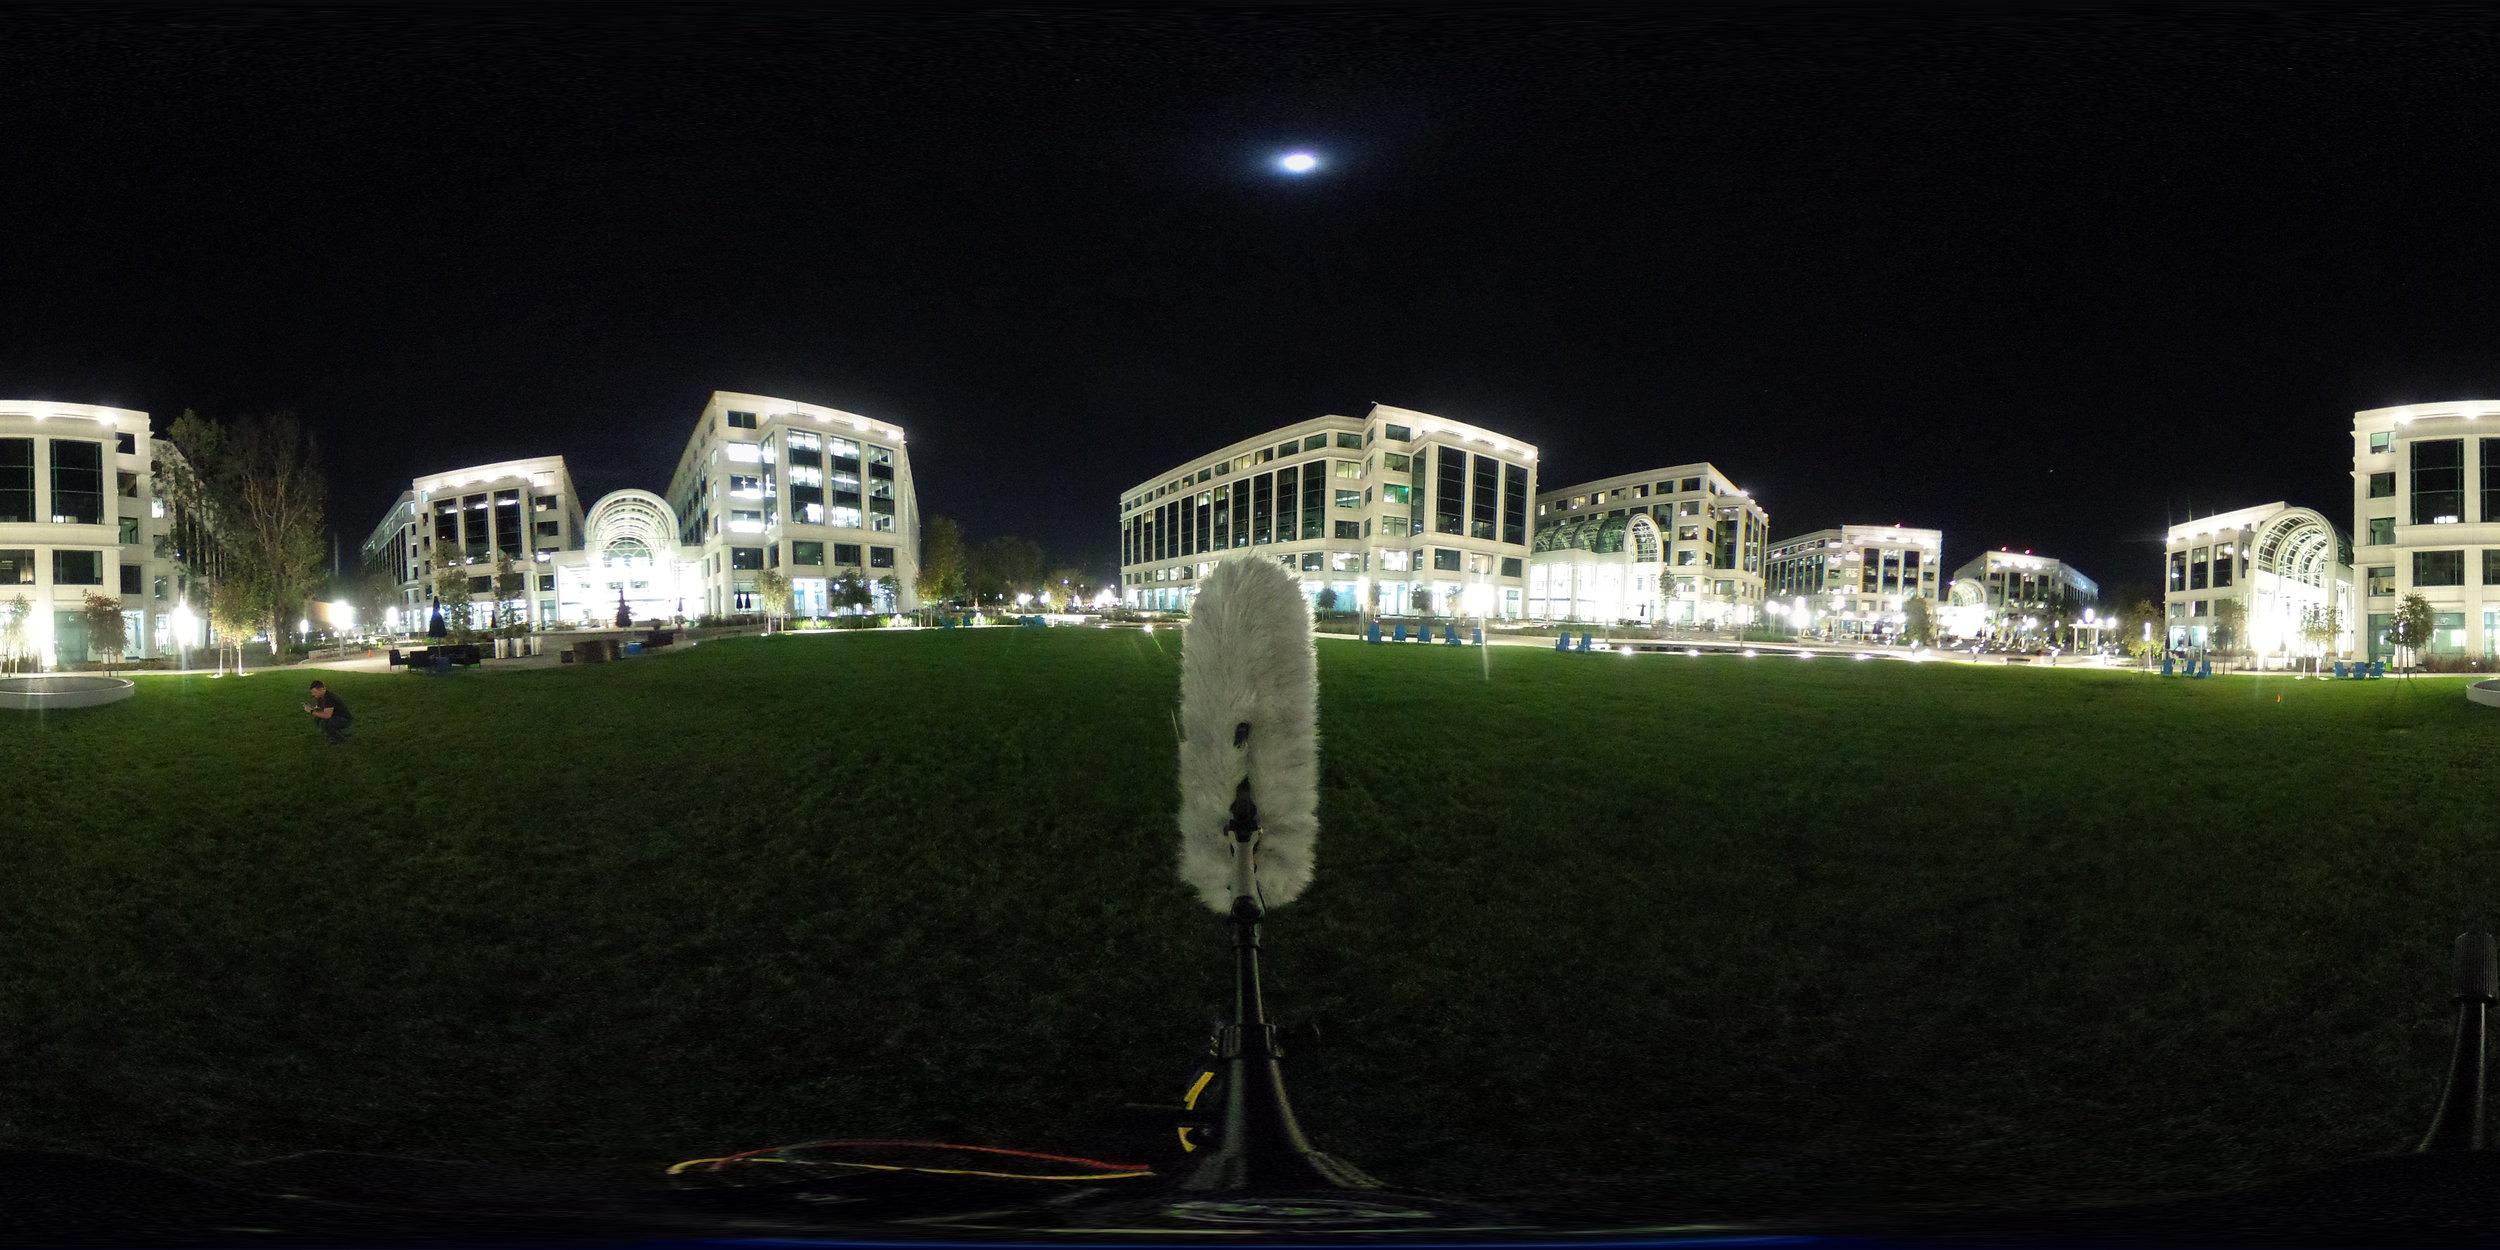 EXT_Night_Park_City_MediumFountain_VeryDistantTraffic_CityRumble_360PictureReference.JPG